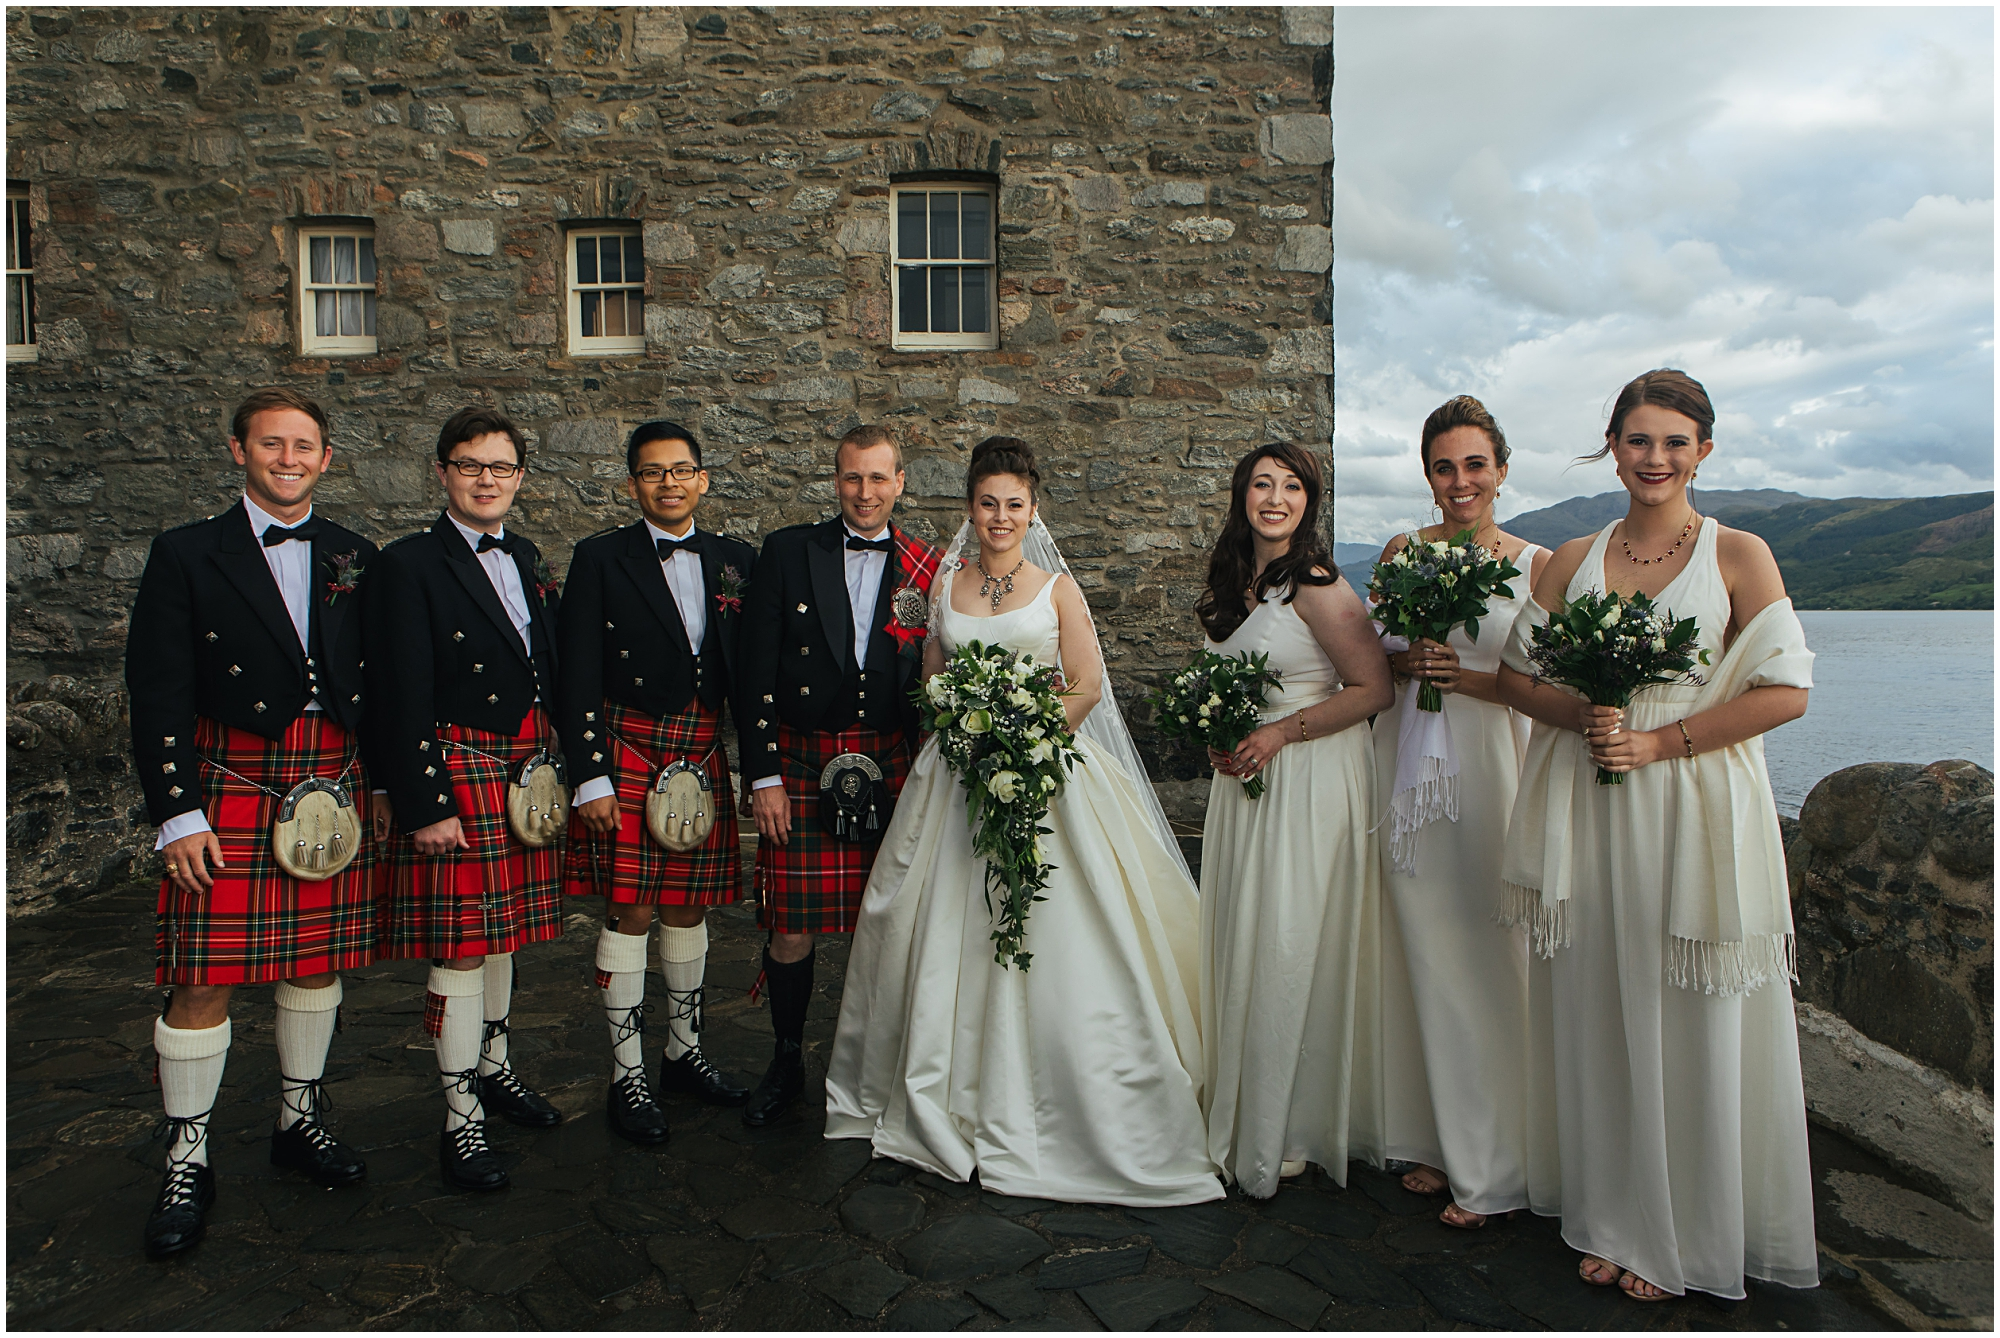 Eilean Donan Castle wedding photographer, eilean Iarmain hotel wedding photography